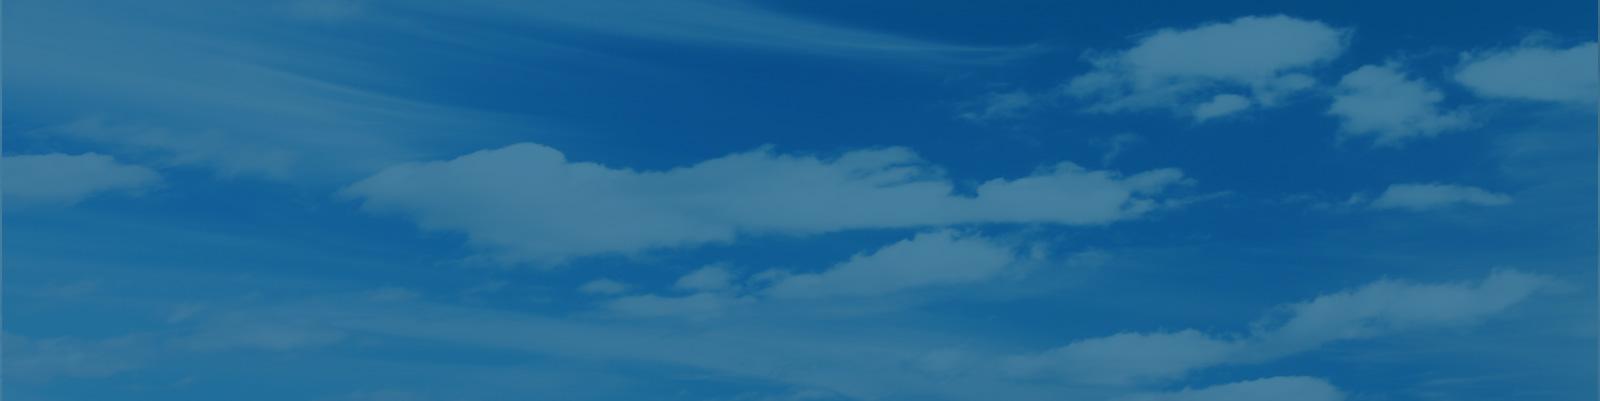 NEXT-2016-Cloud-Photo-for-BIAK-Homepage-w-Blue-Overlay